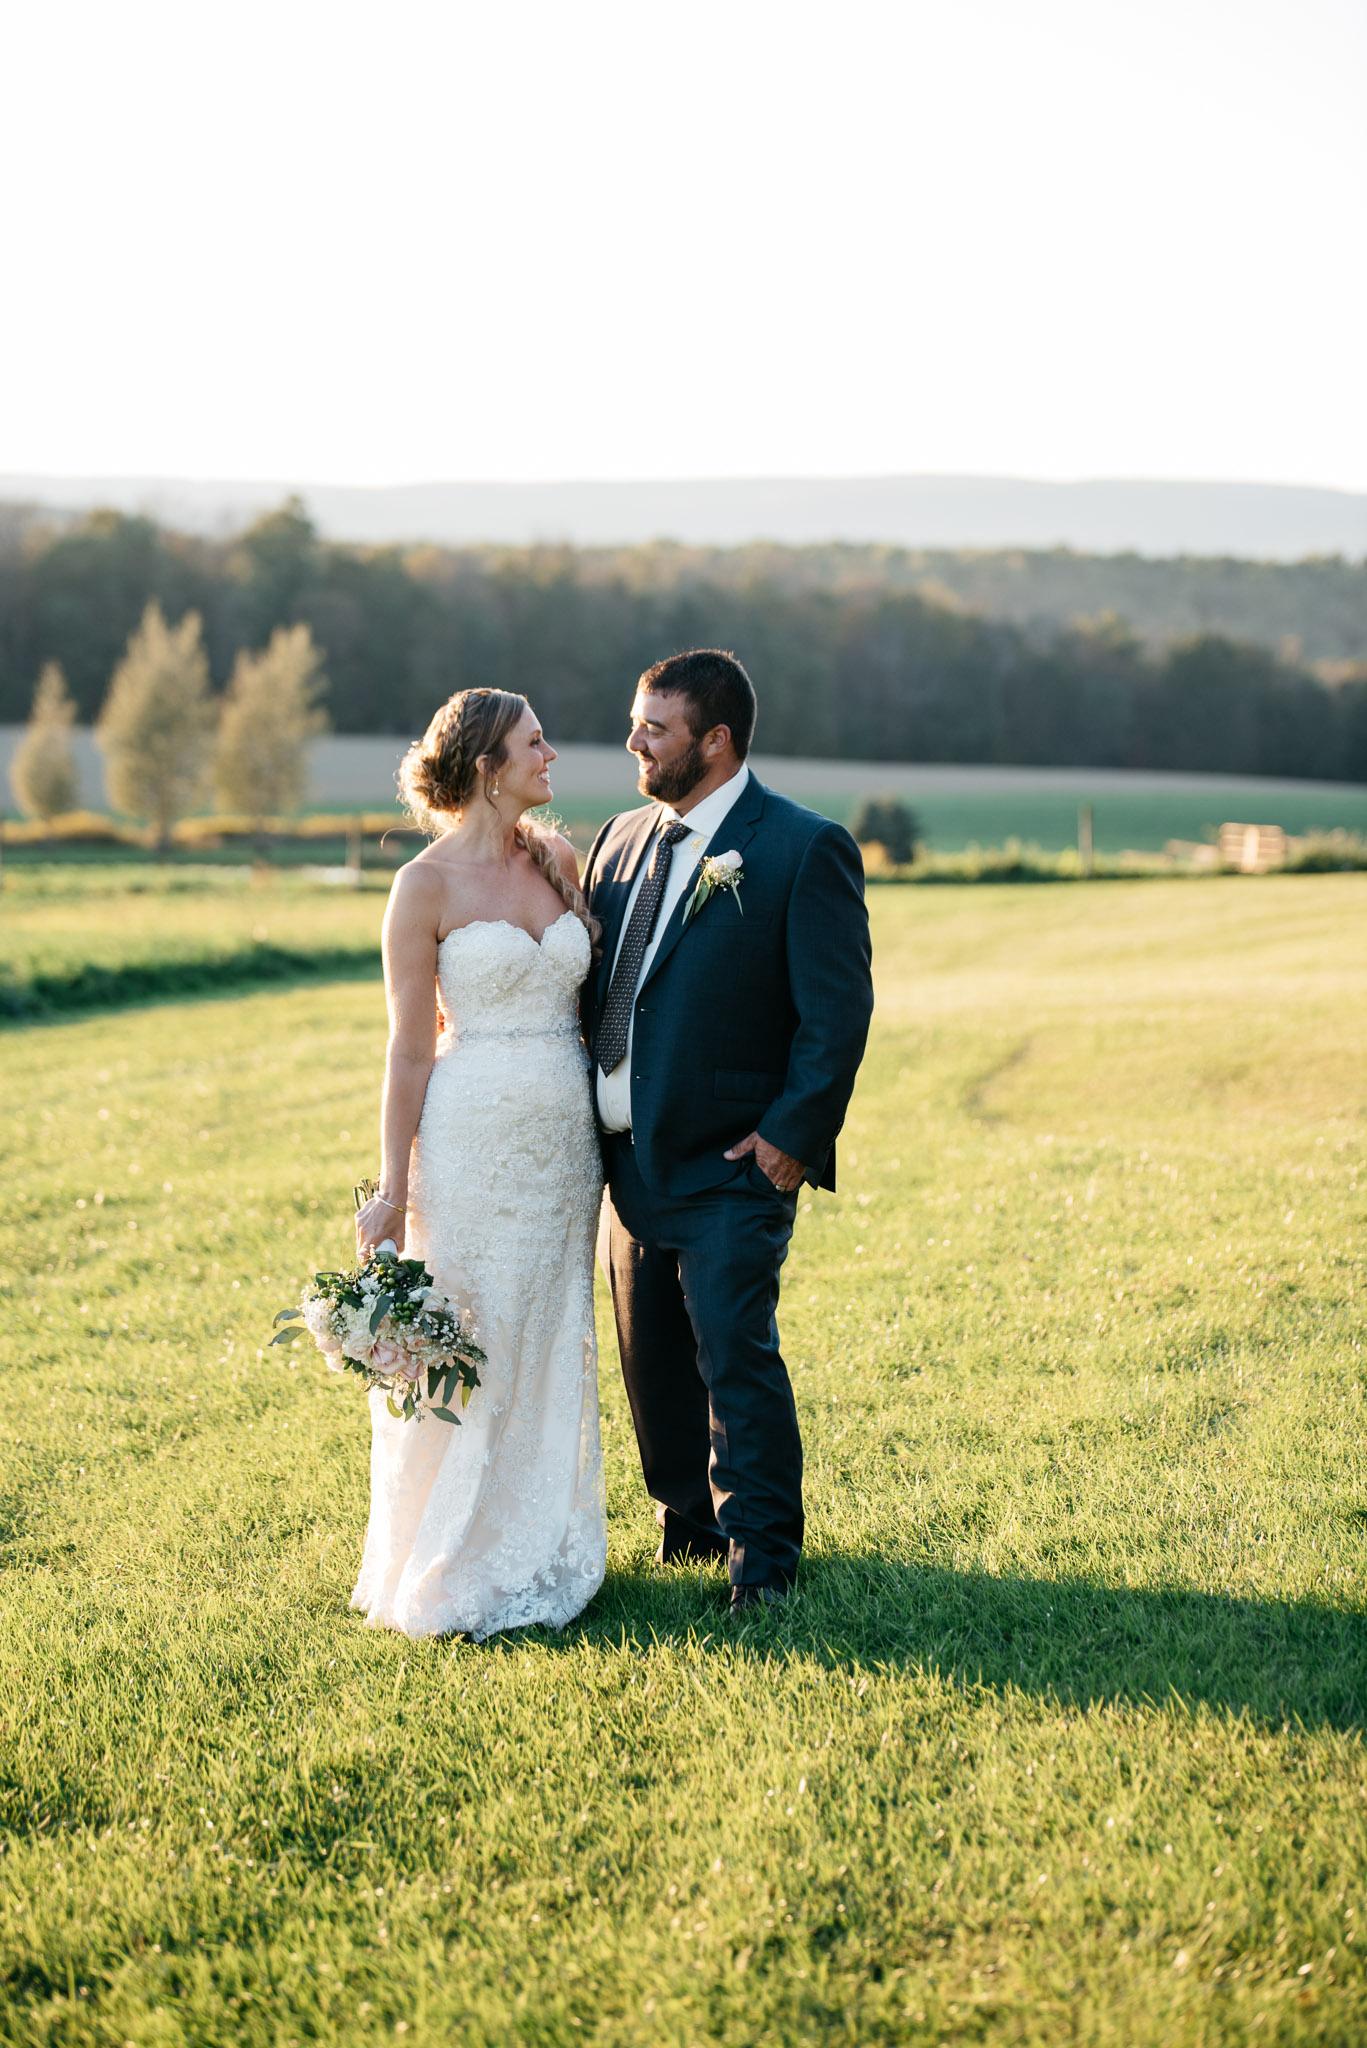 pittsburgh-ligonier-wedding-photographer-the-event-barn-at-highland-farms-47.jpg